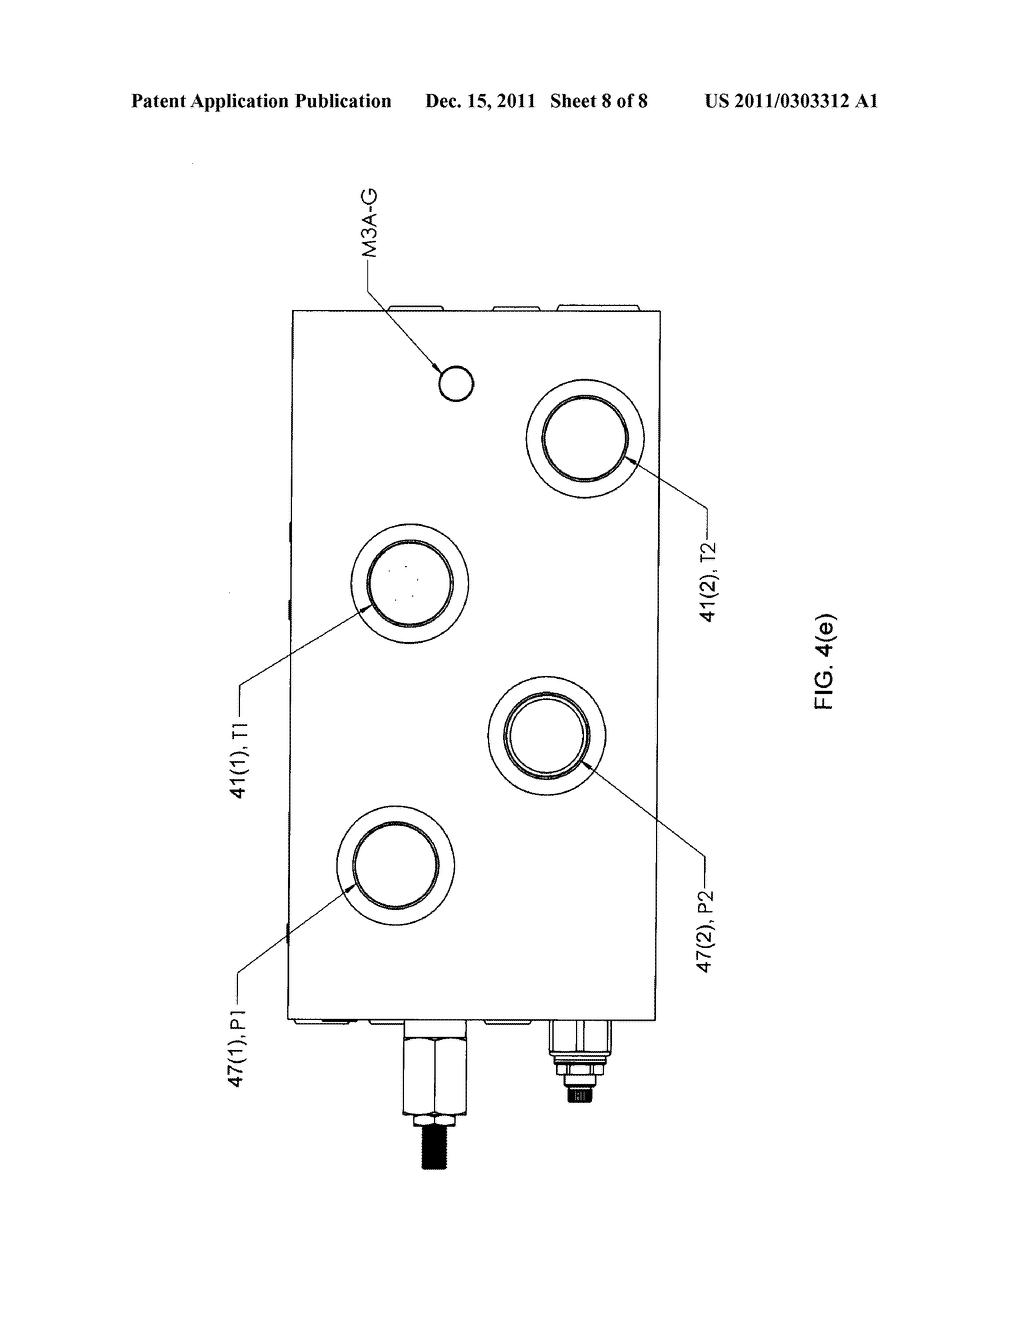 binary hydraulic manifold system diagram schematic and image 09 rh patentsencyclopedia com hydraulic manifold schematic symbols Diesel Hydraulic Schematics